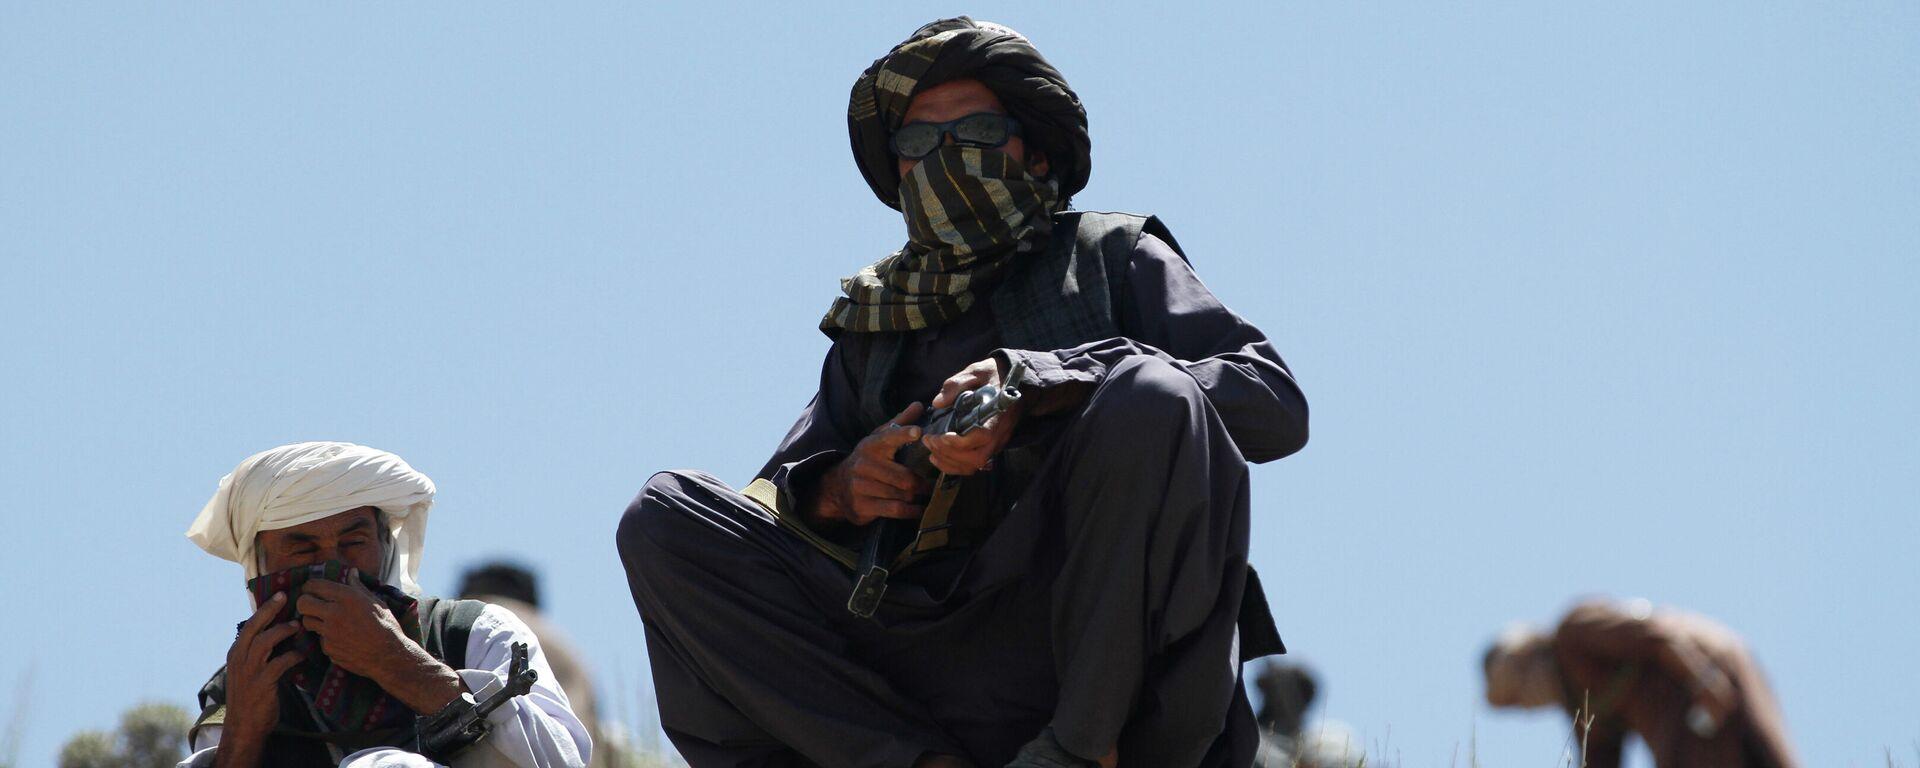 Боевики движения Талибан. Архивное фото - Sputnik Узбекистан, 1920, 23.06.2021